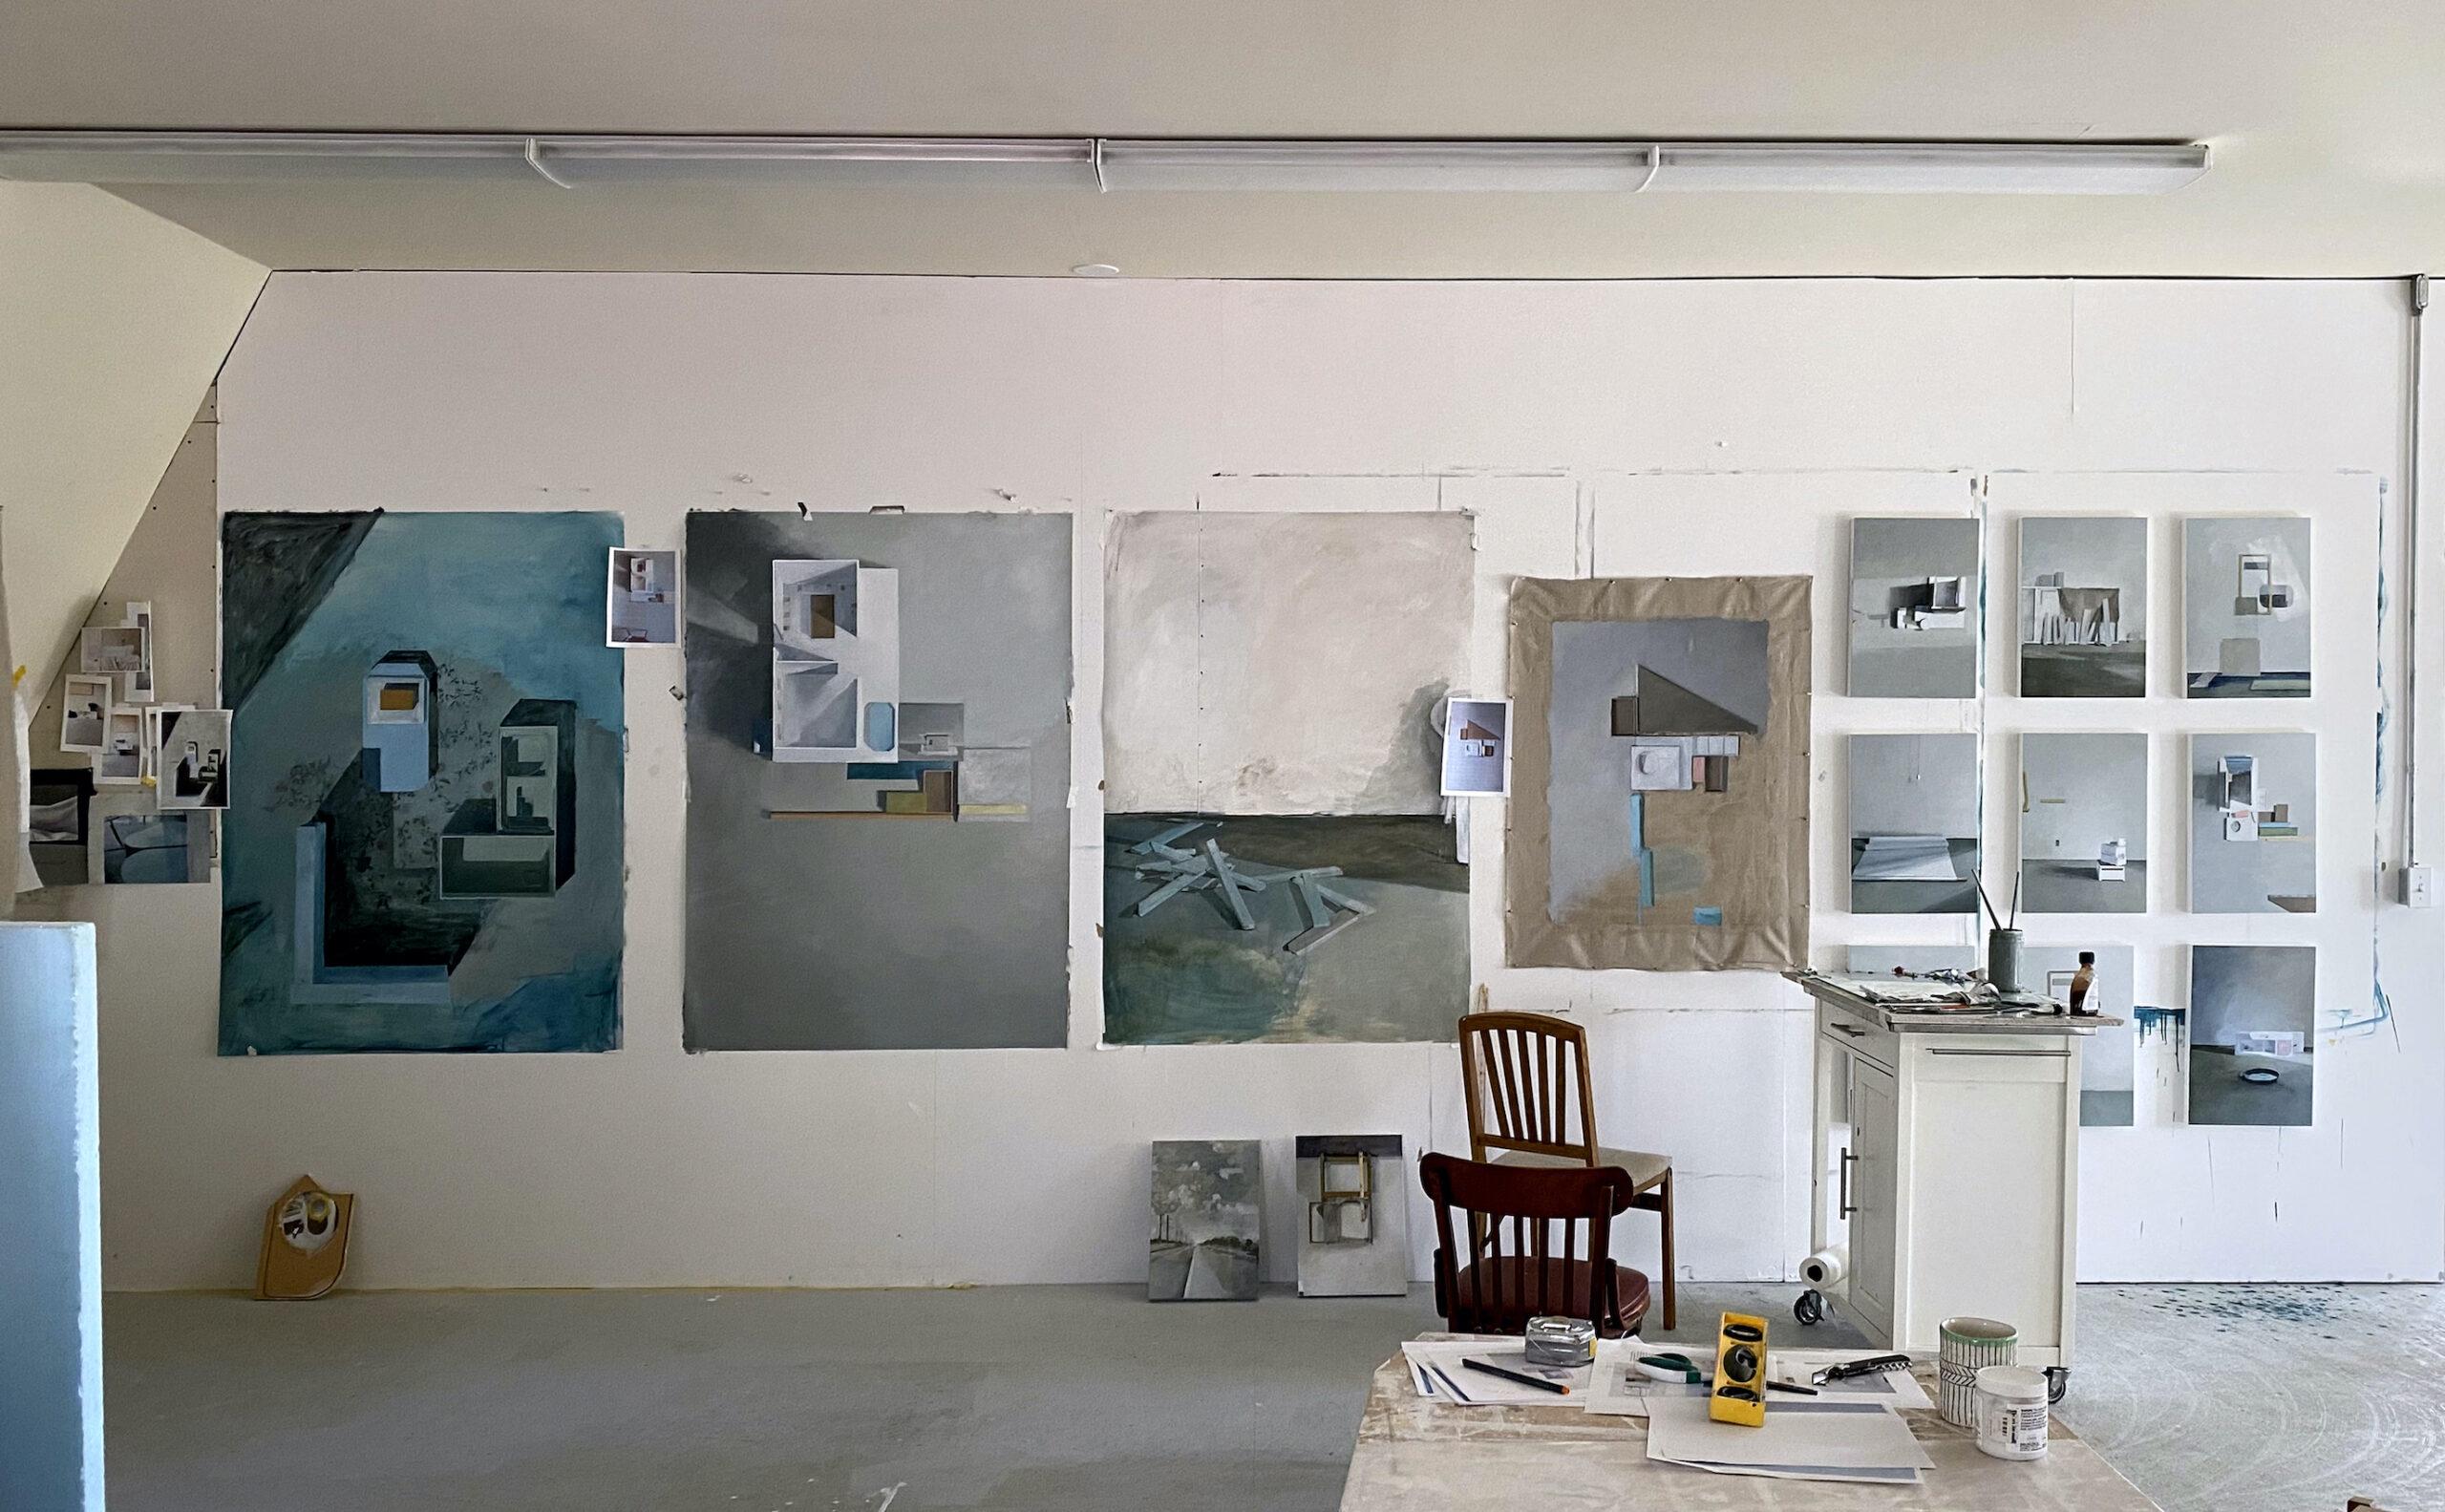 Jenny Brillhart, Studio Wall (Studio Photo), 2021